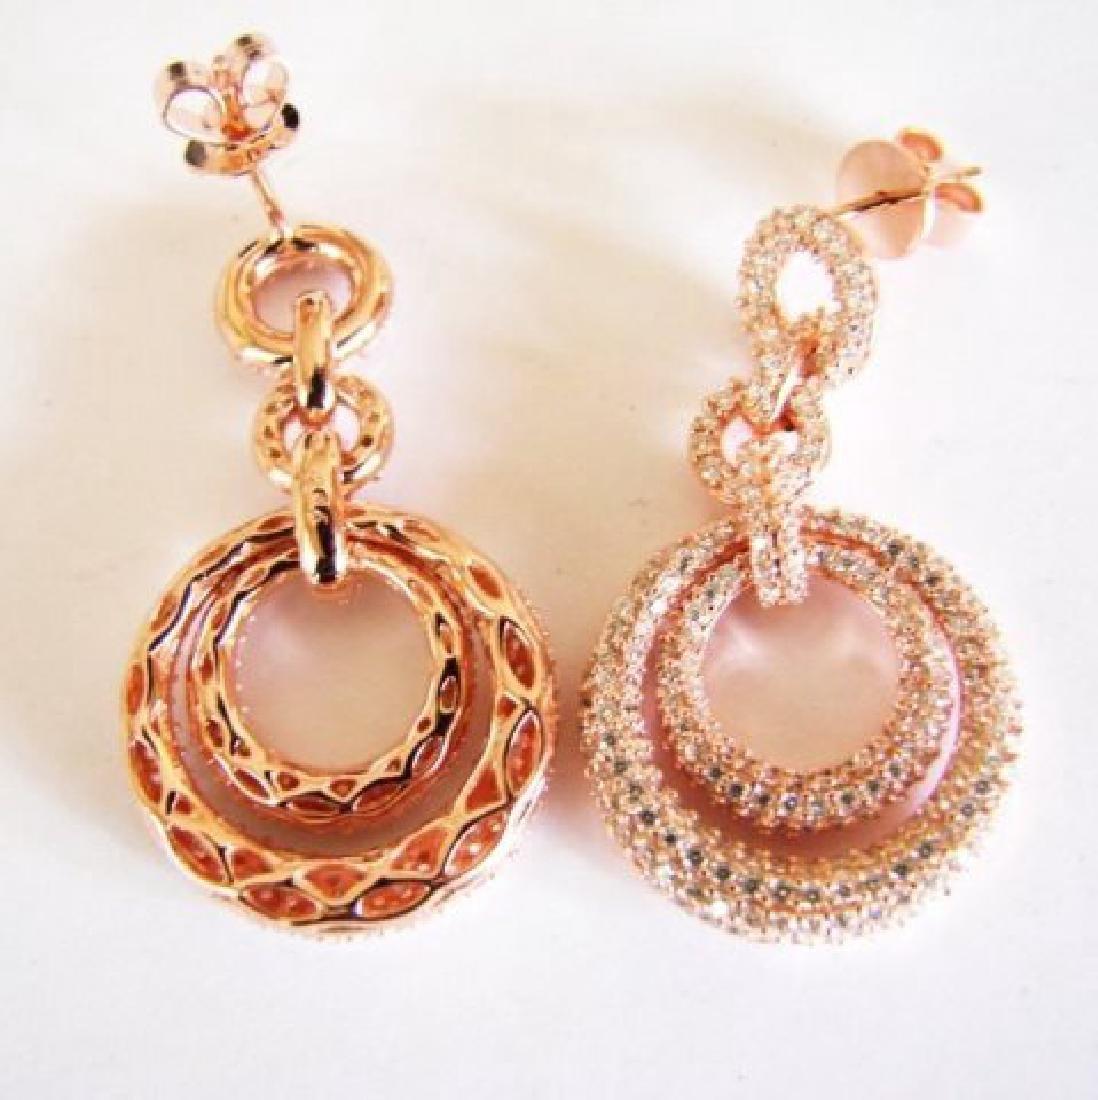 Creation Diamond Earring 4.12Ct 18k R/g Overlay - 3